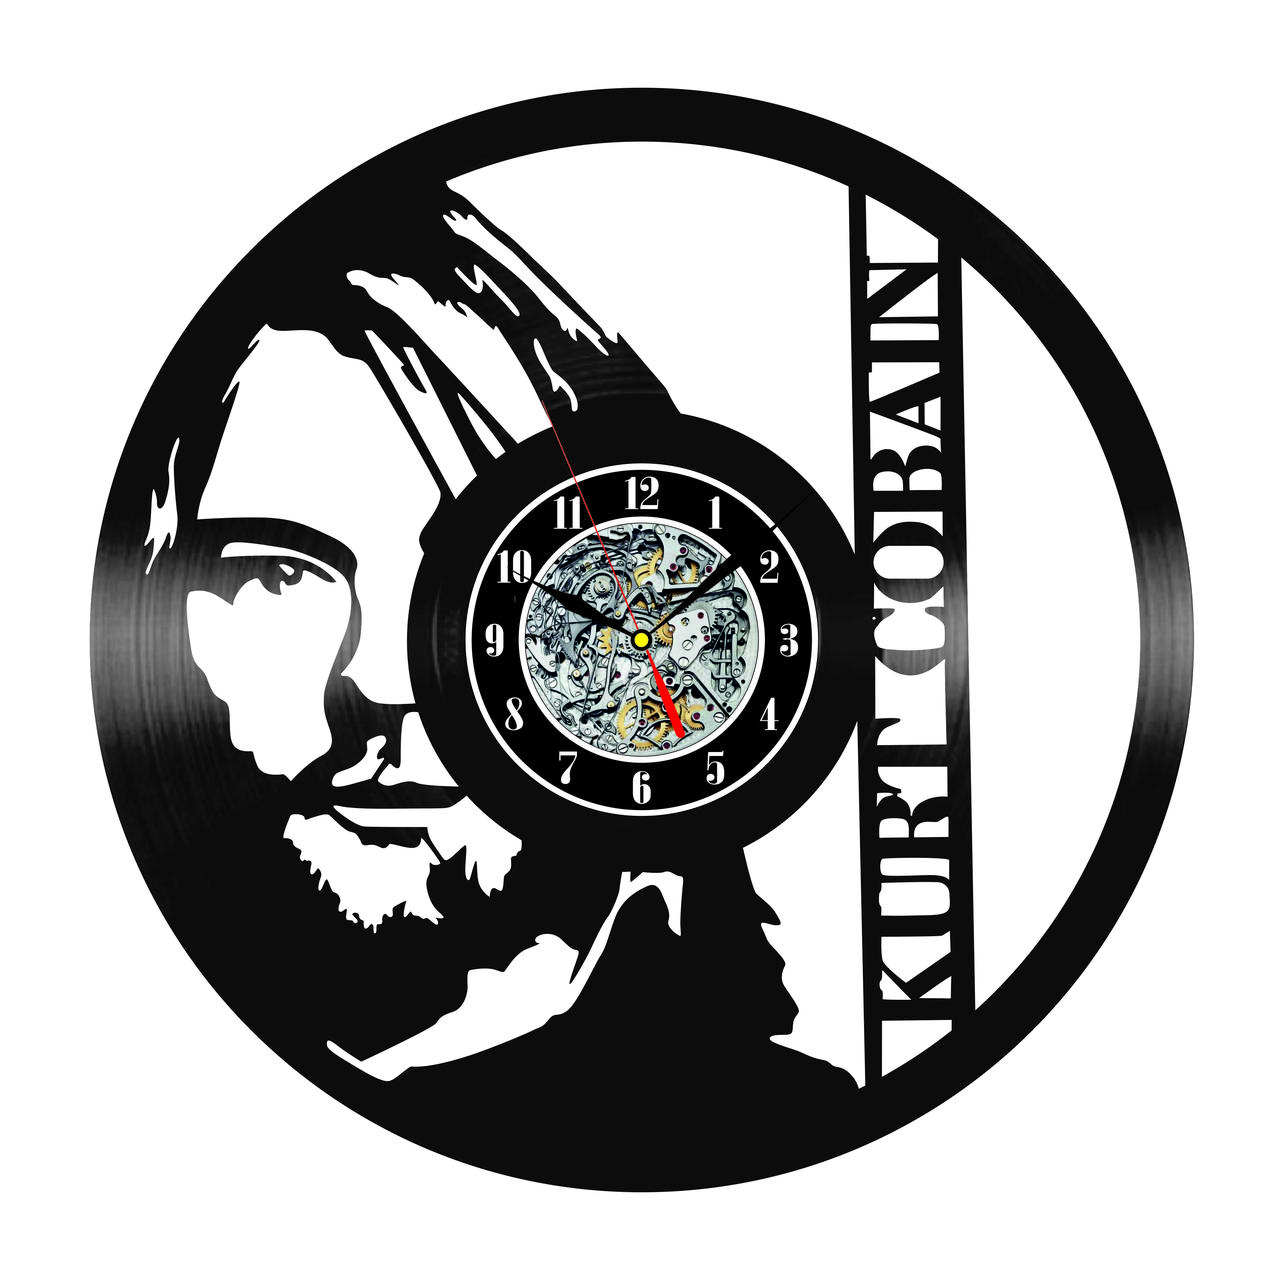 Настенные часы из виниловых пластинок LikeMark Nirvana #1